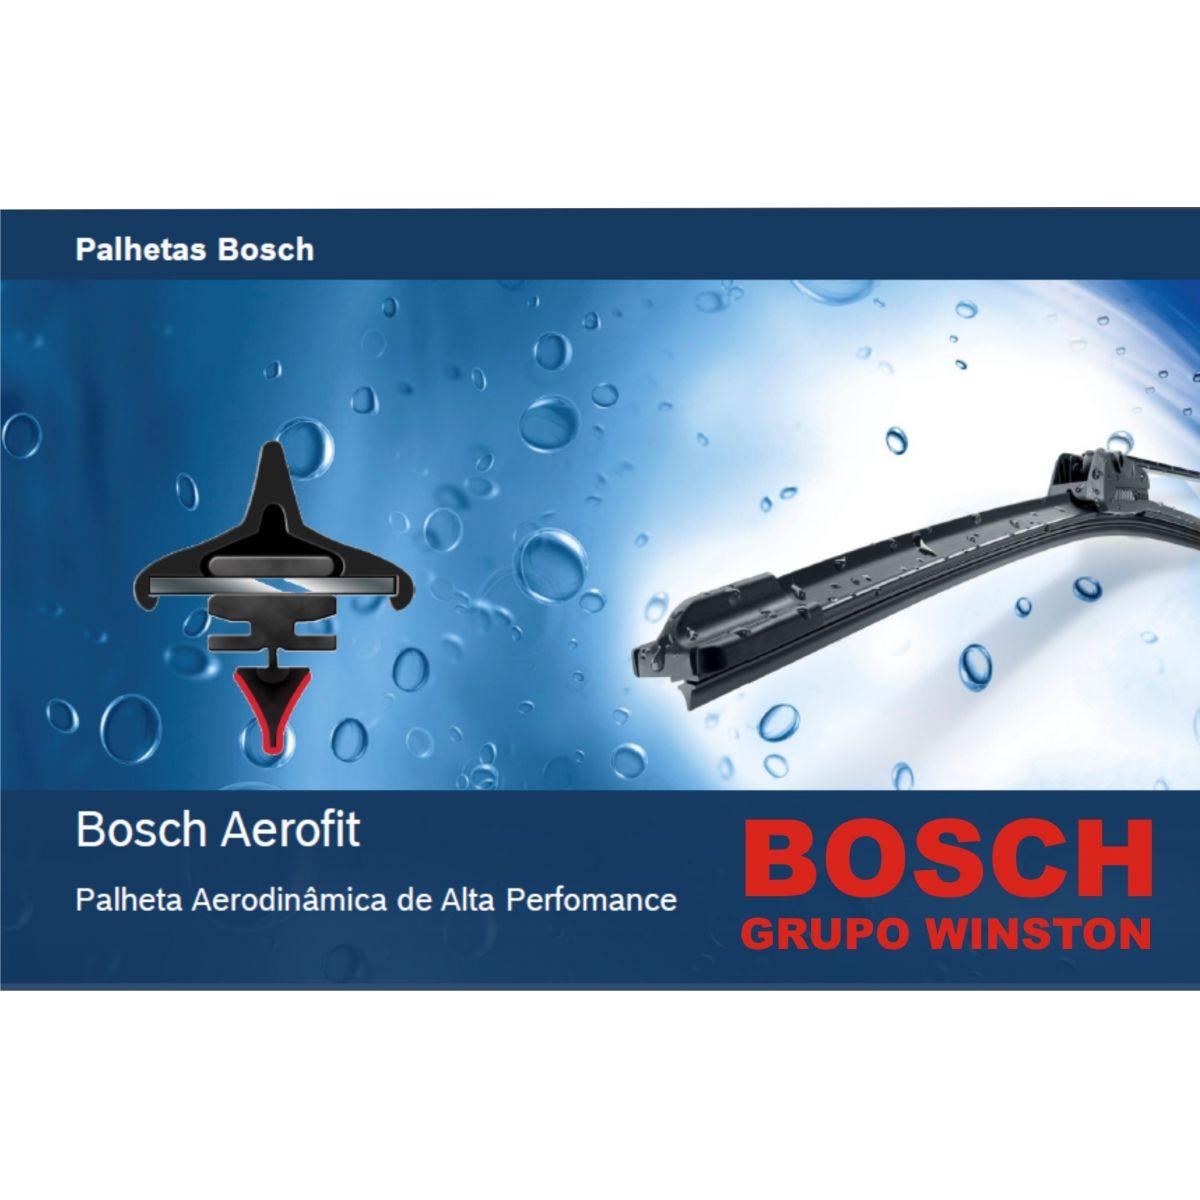 Palheta Bosch Aerofit Limpador de para brisa Bosch KIA Carnival